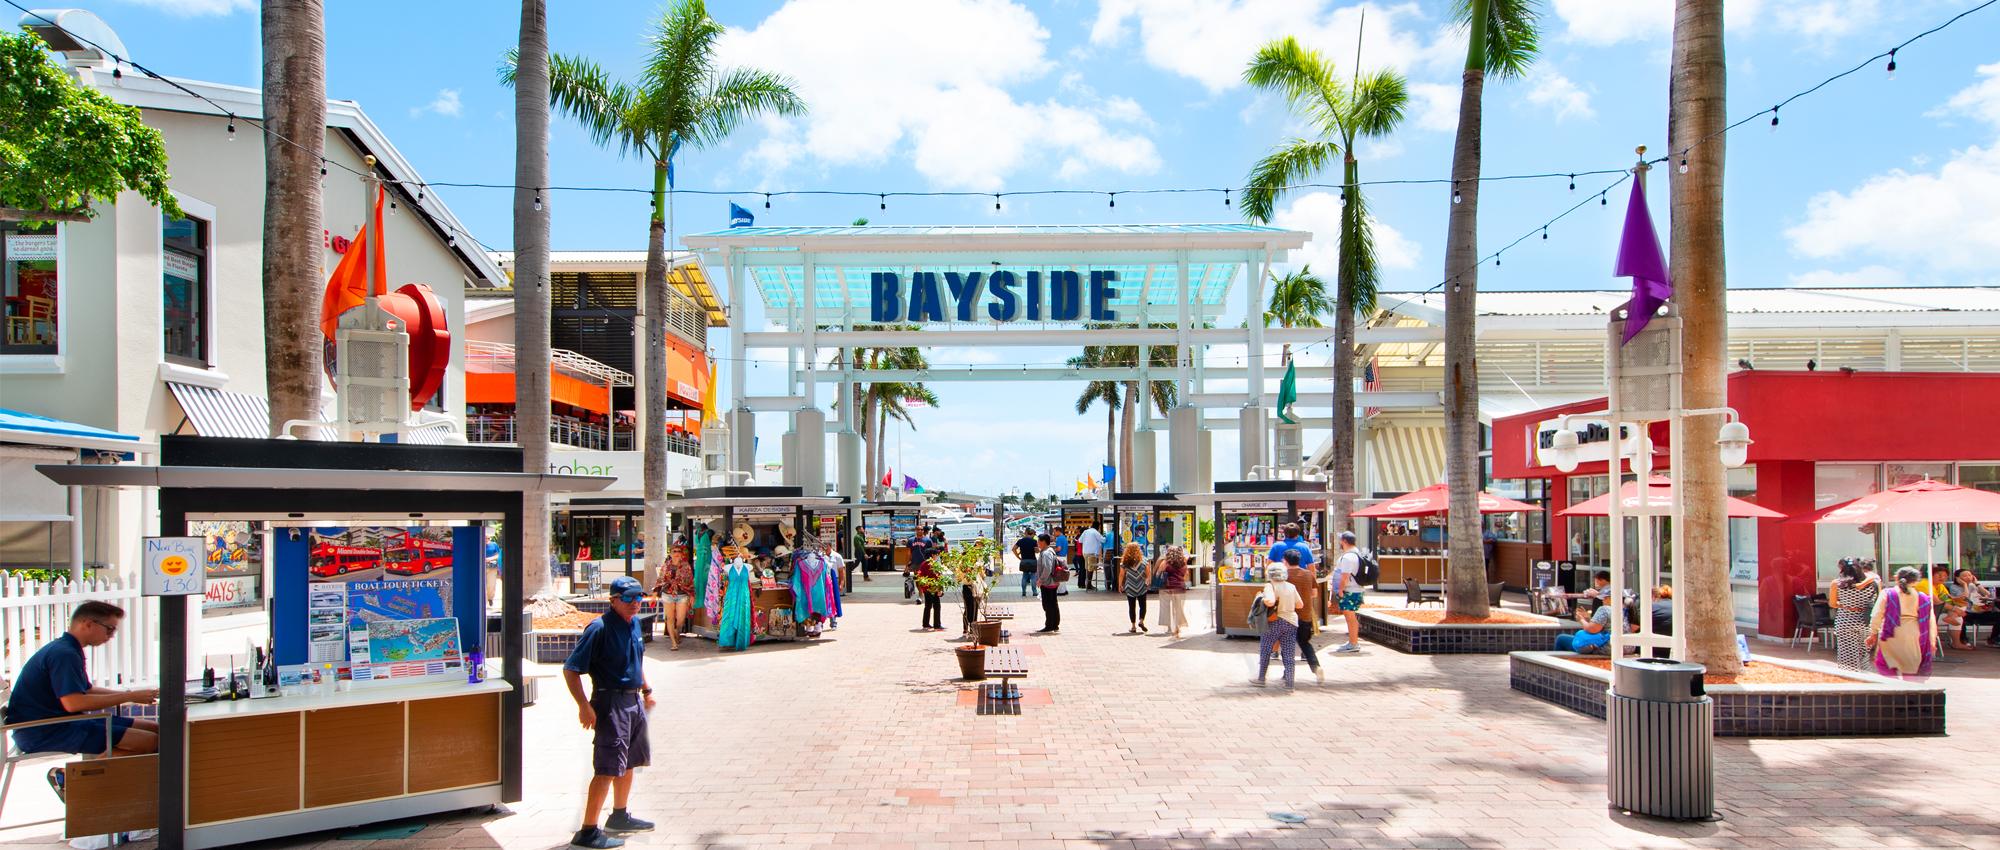 Restaurants Near Bayside Marketplace Miami